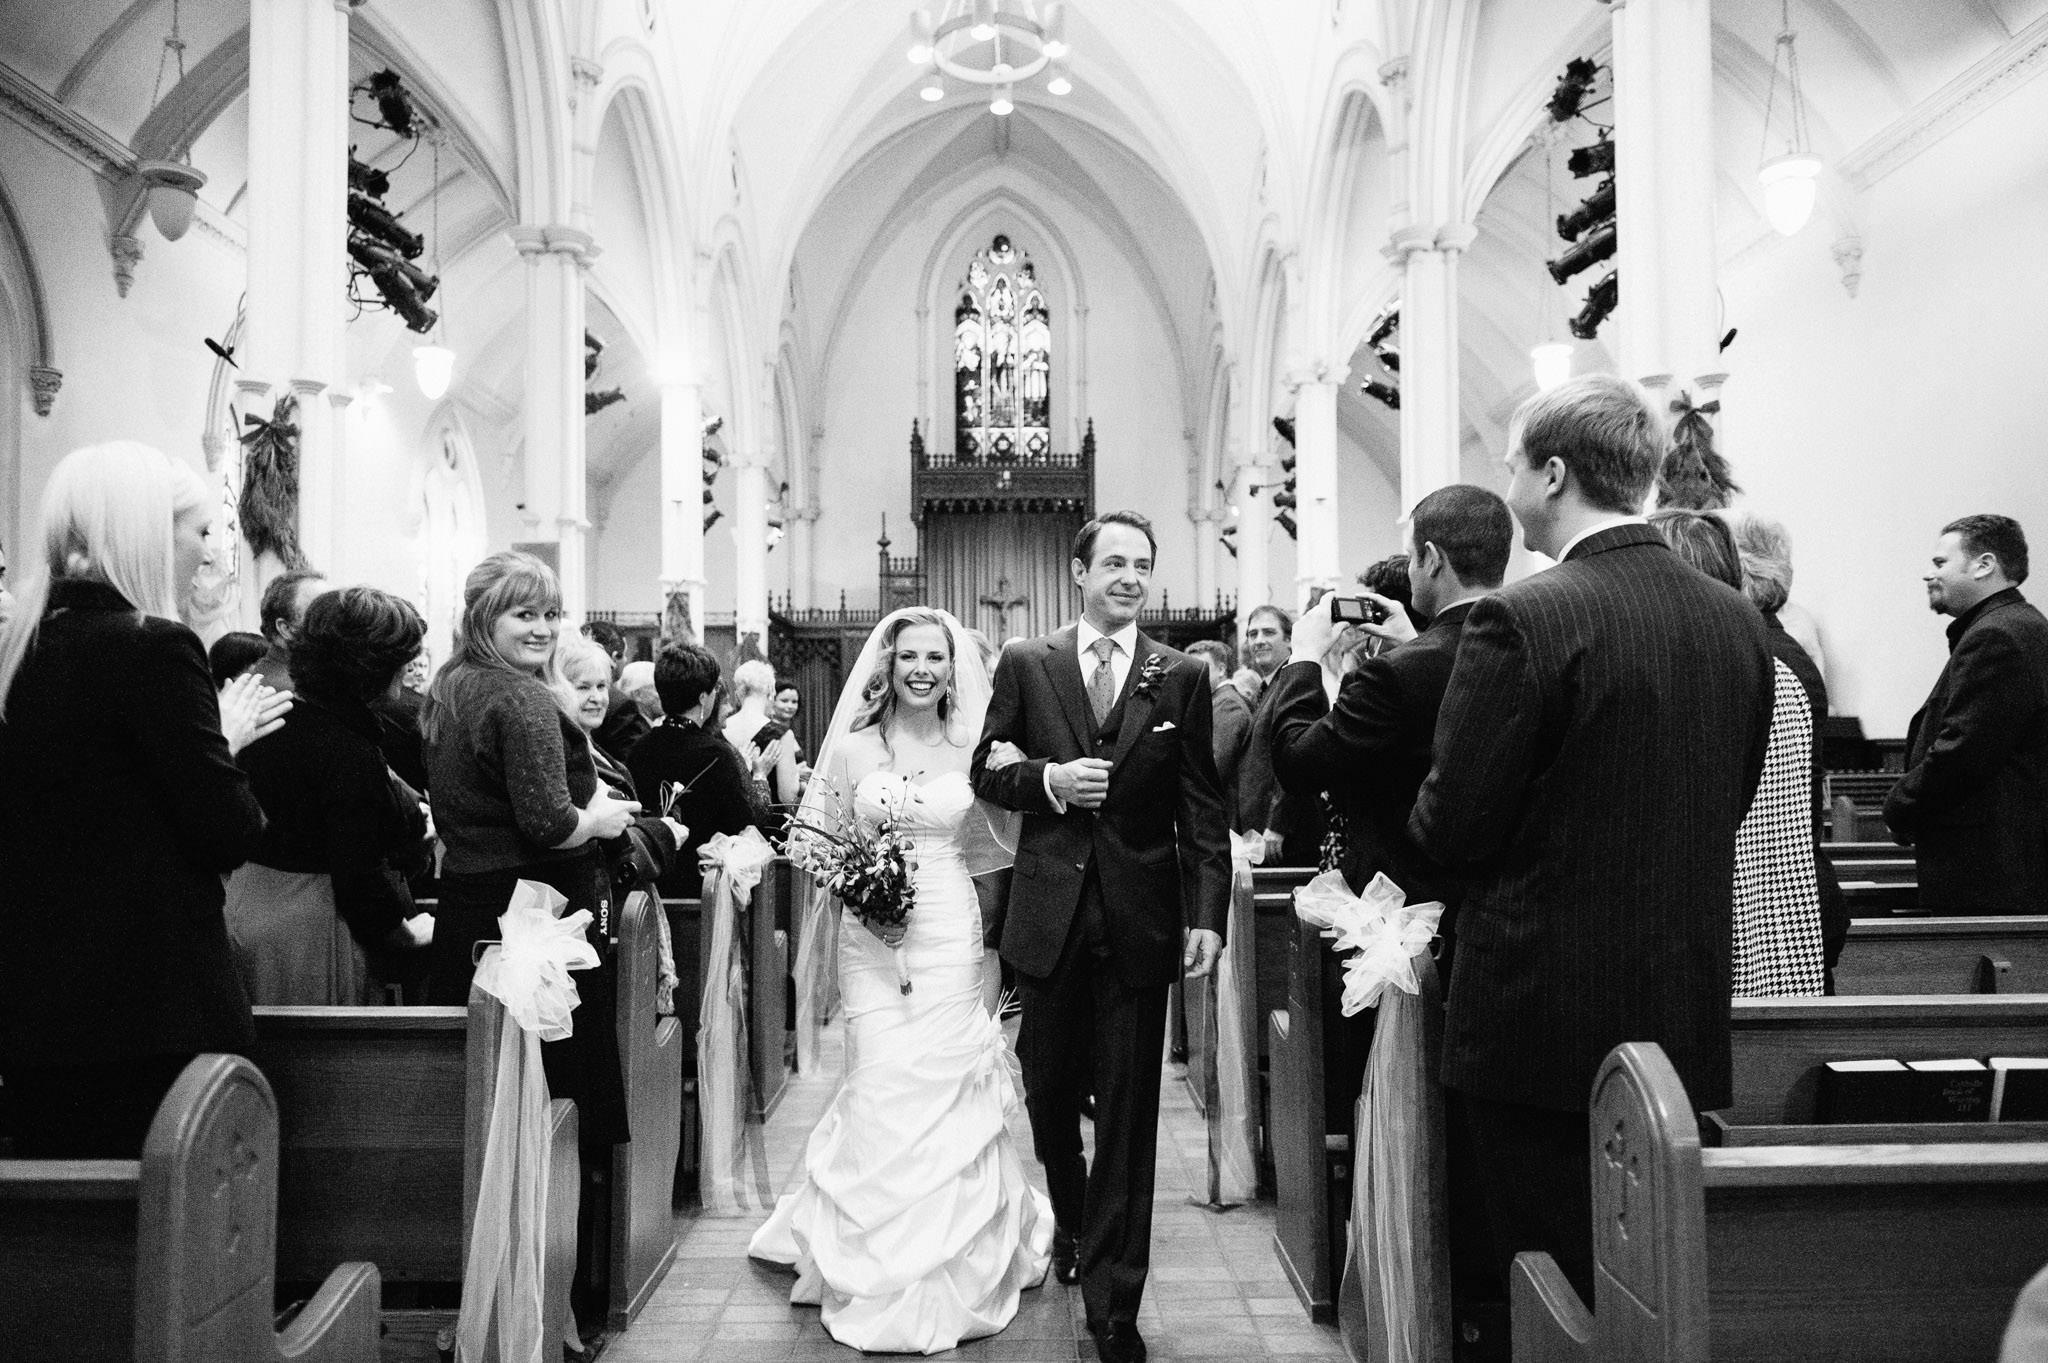 St Basil's Church wedding